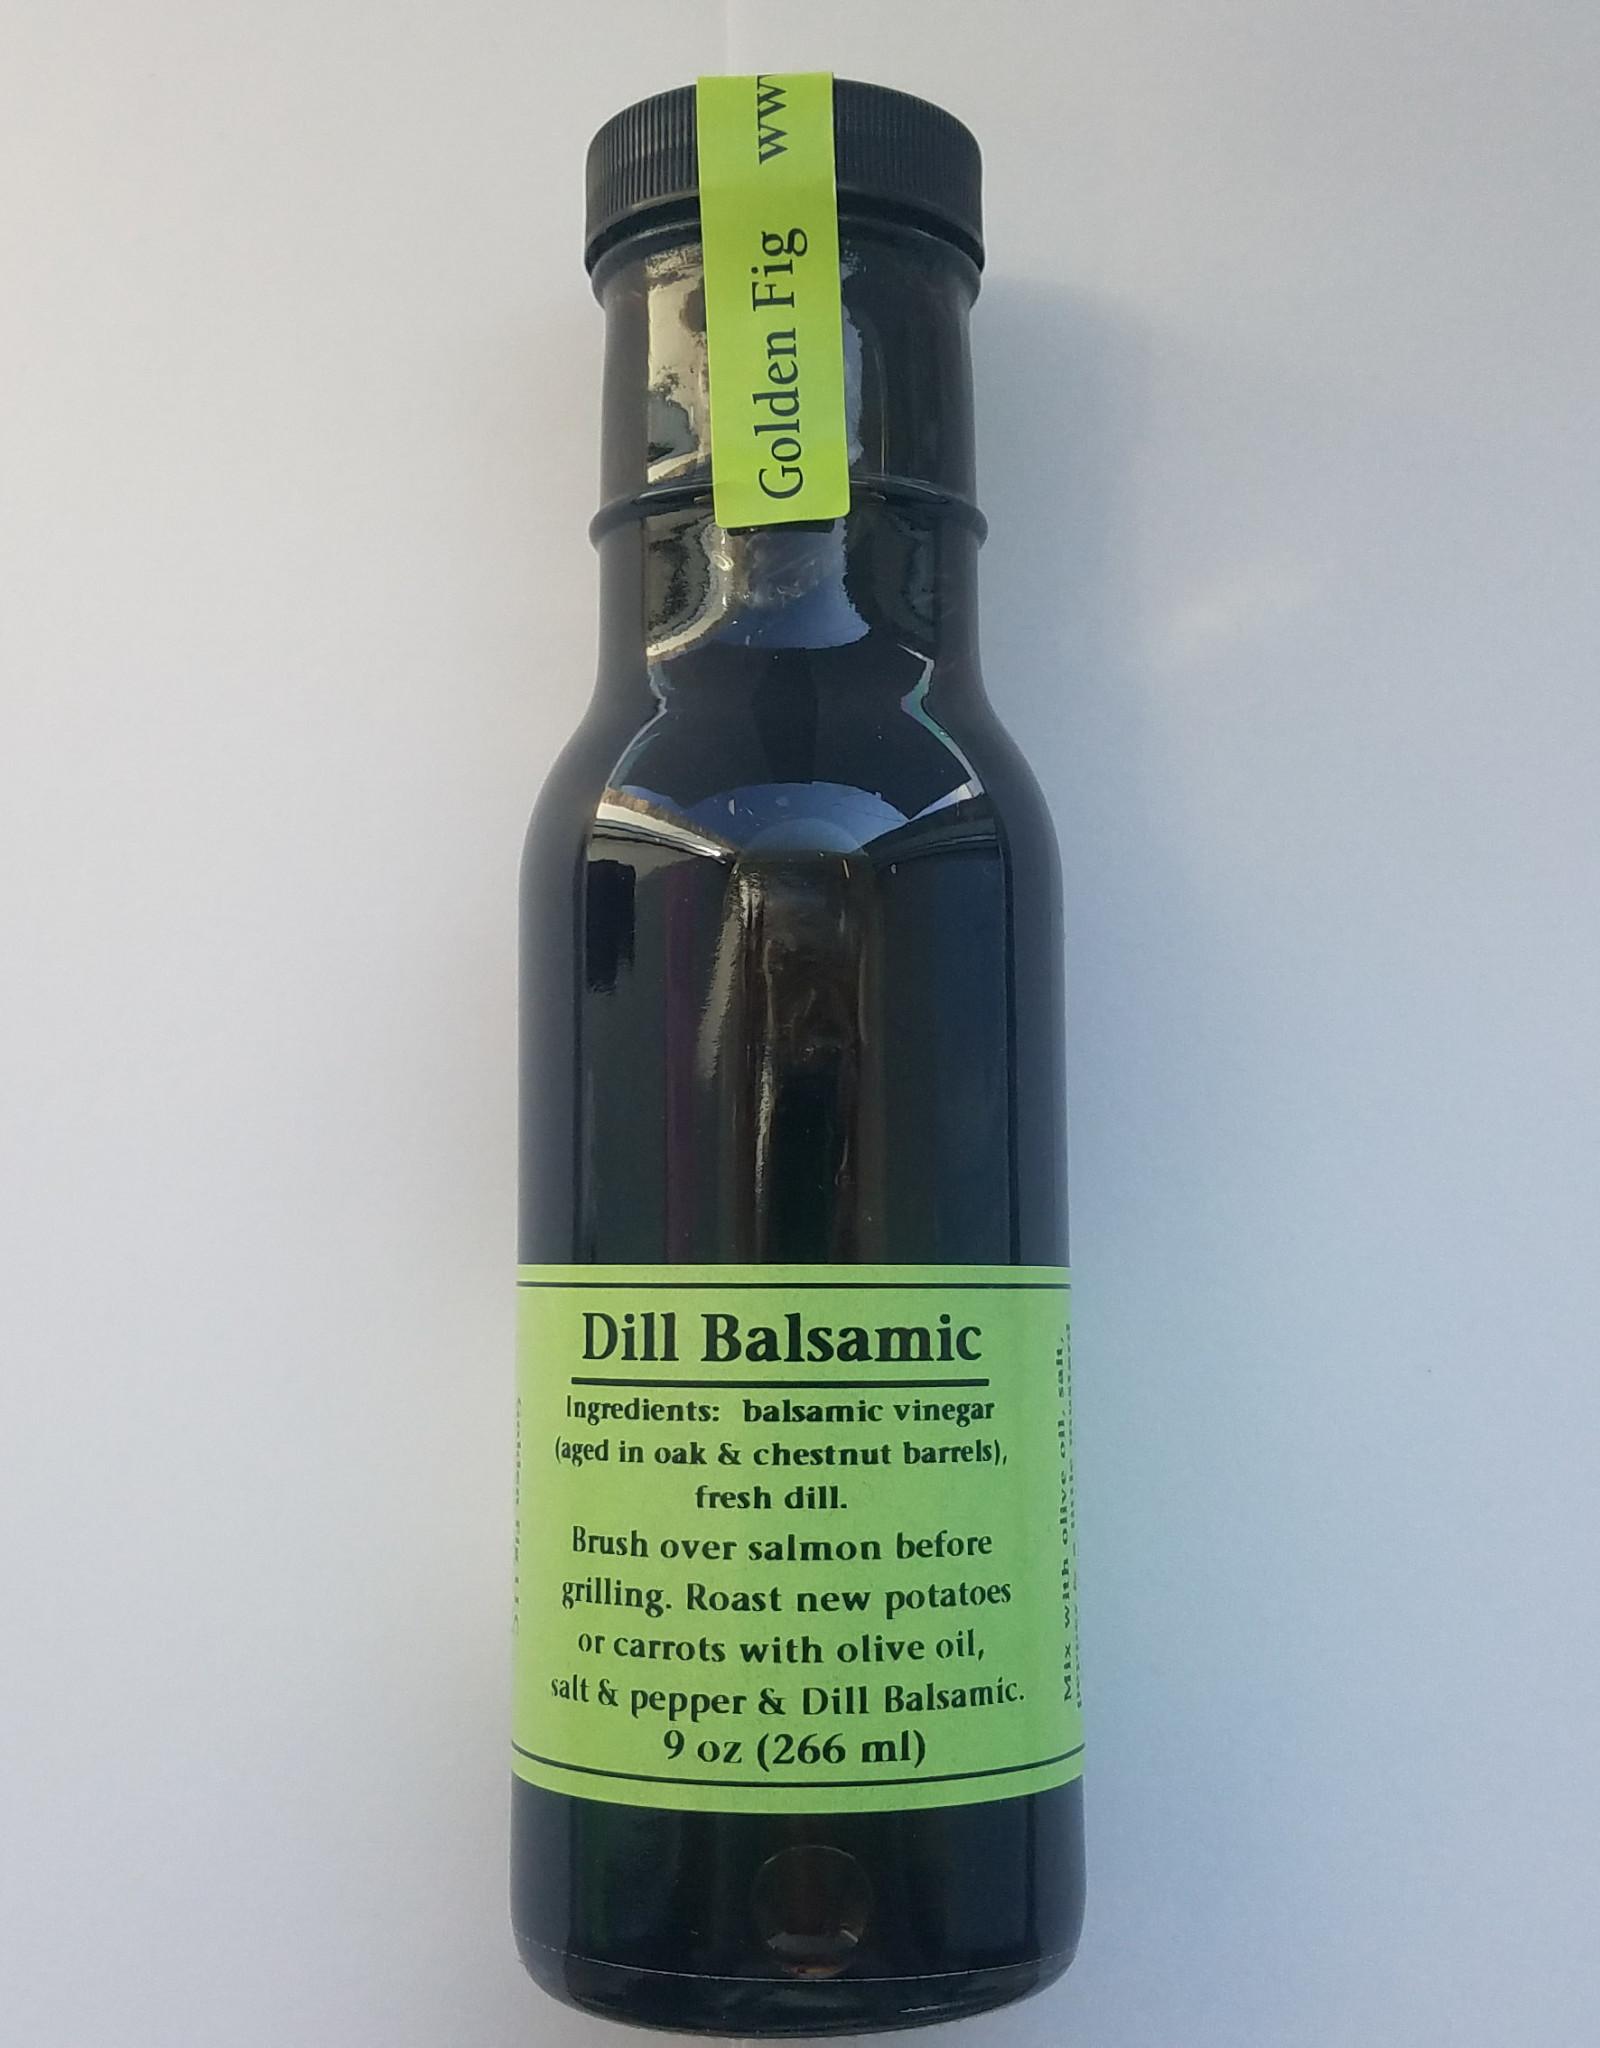 Golden Fig Dill Balsamic Vinegar